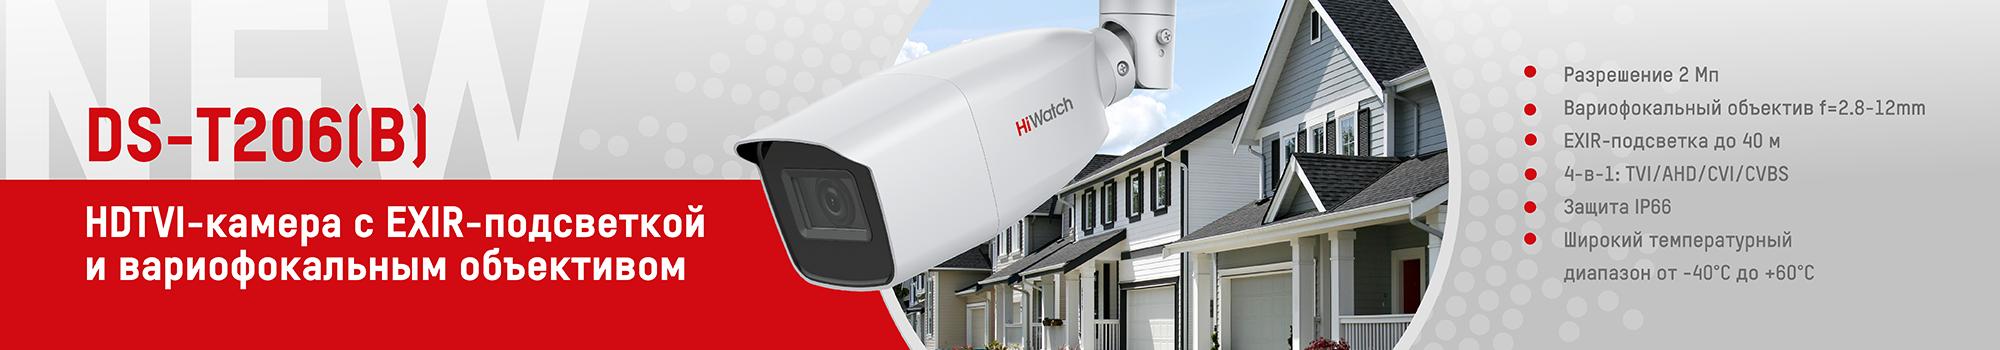 Модель TVI-камеры HiWatch DS-T206(B)